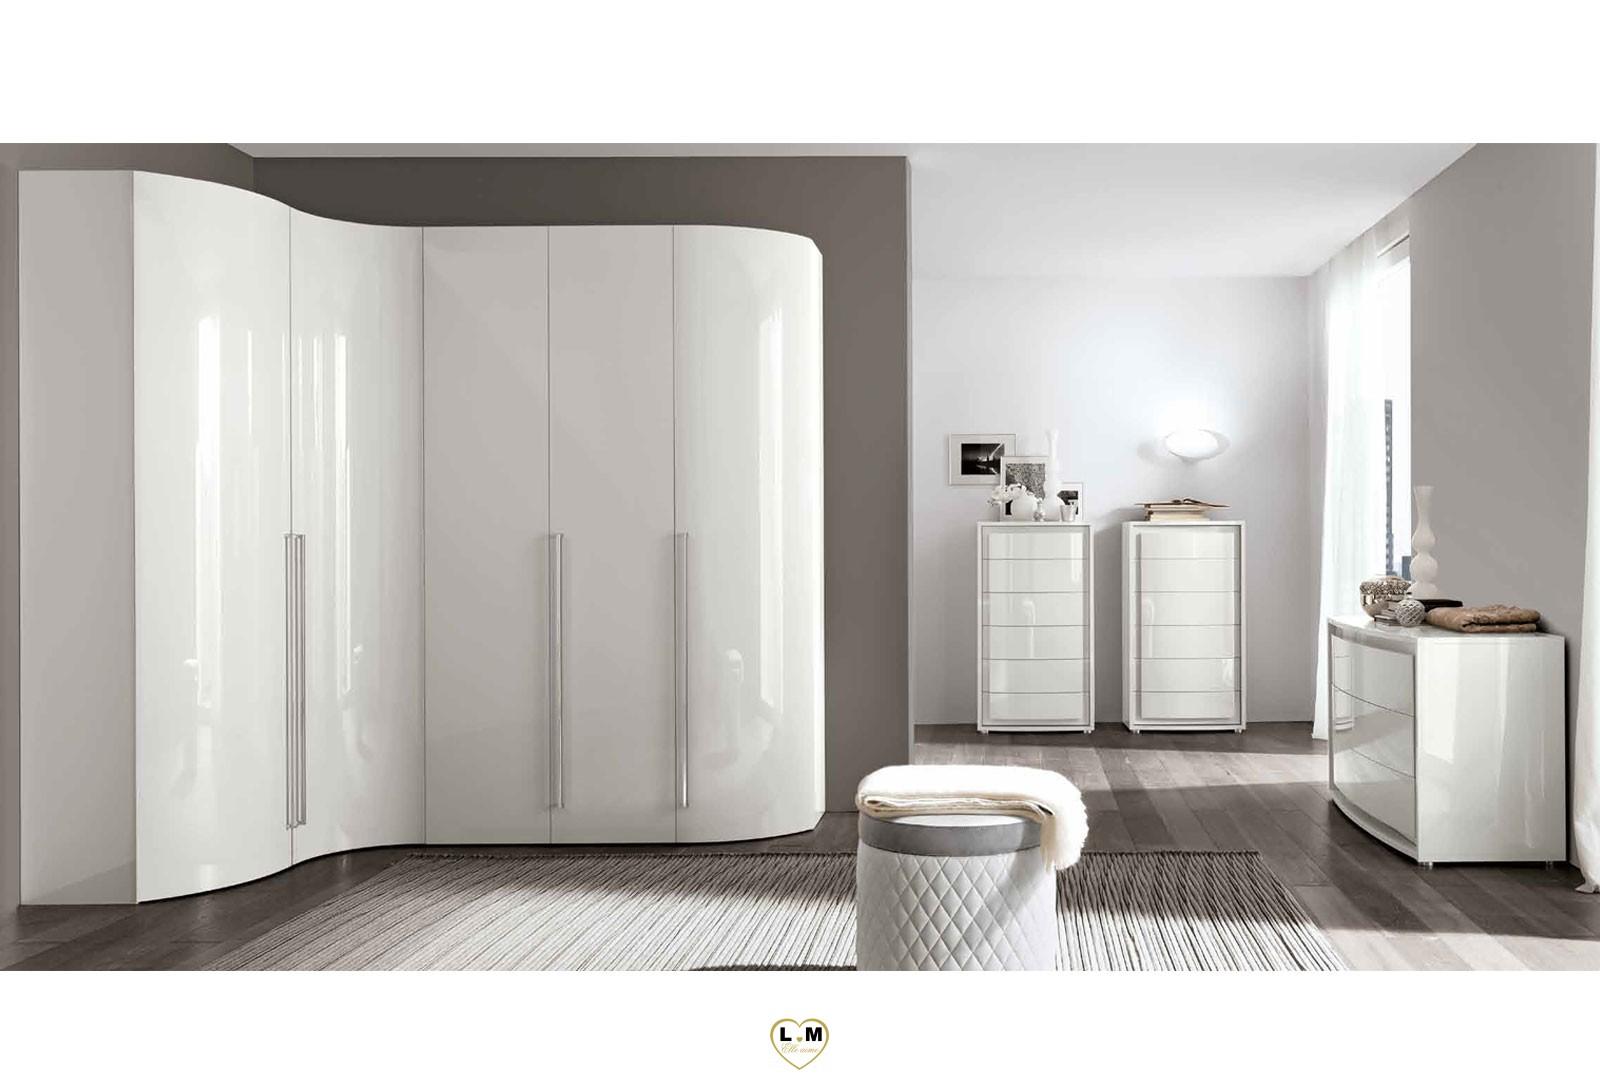 maximus laque blanc brillant chambre a coucher contemporain le chiffonnier lignemeuble com. Black Bedroom Furniture Sets. Home Design Ideas